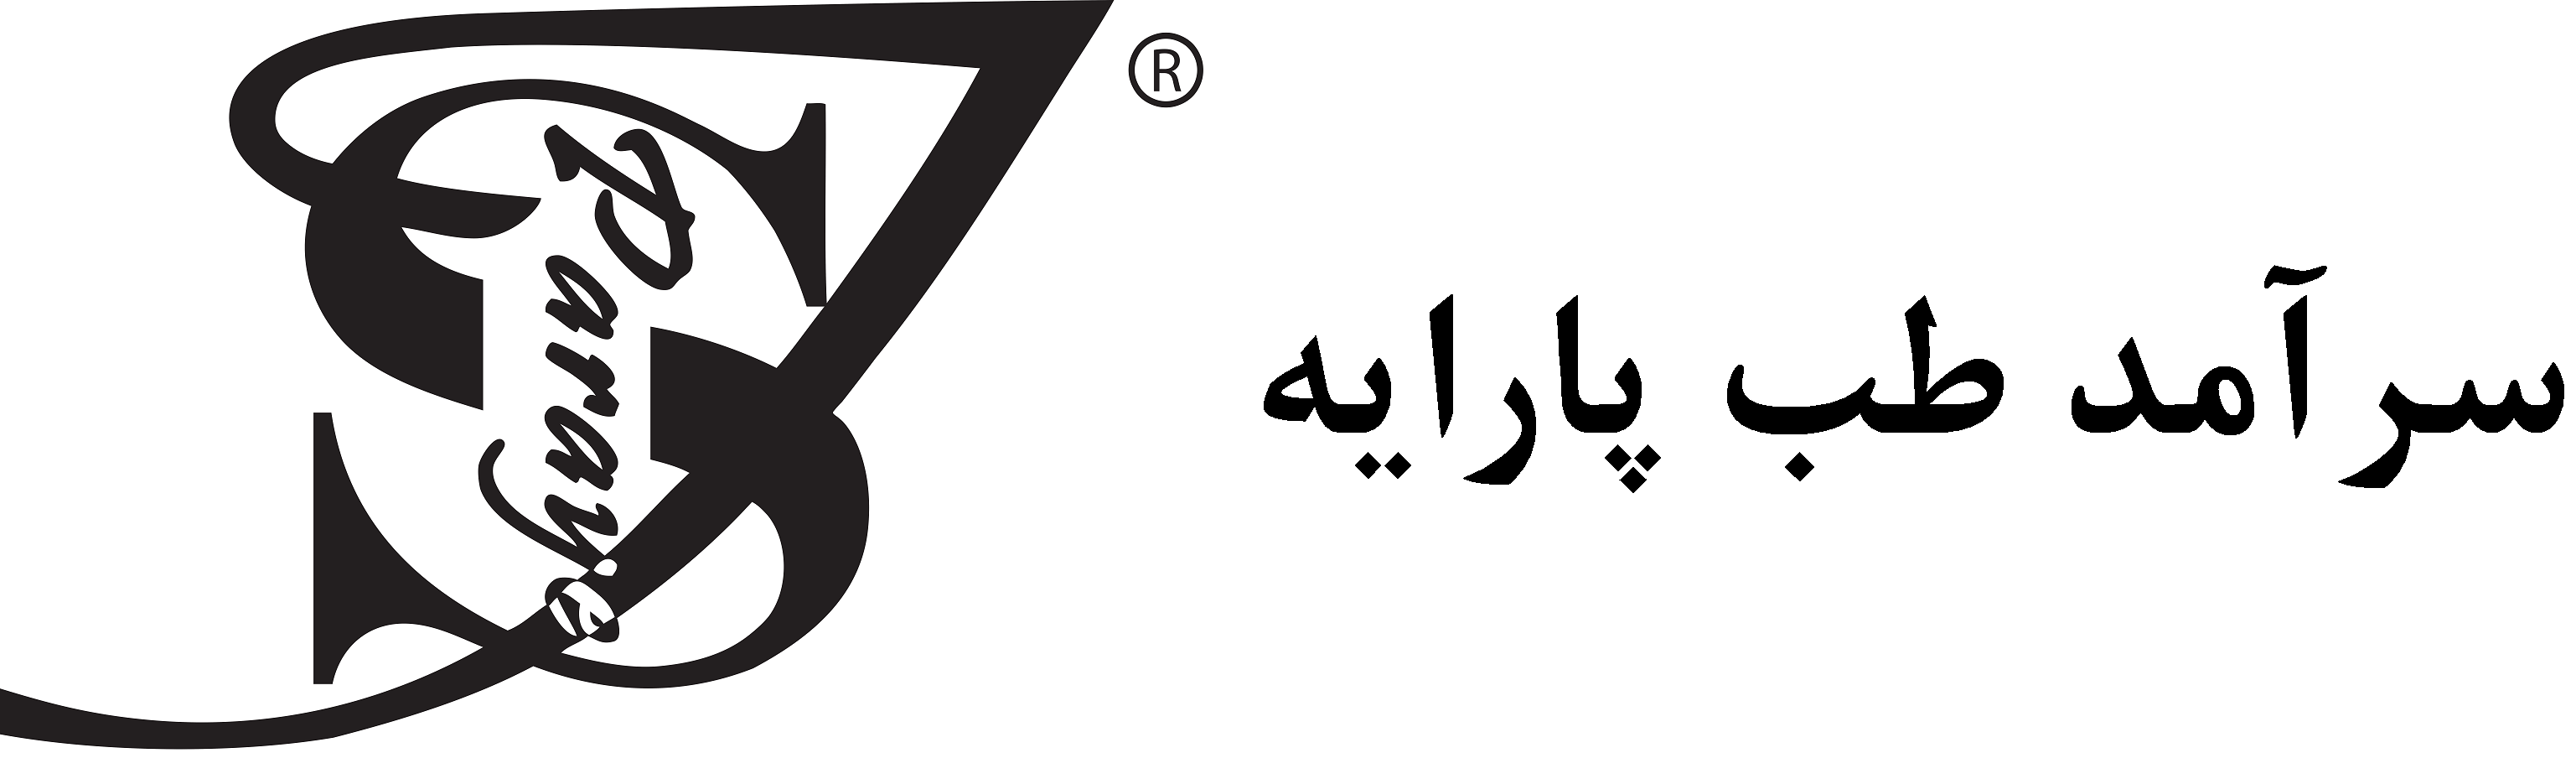 stpArayeh-logo